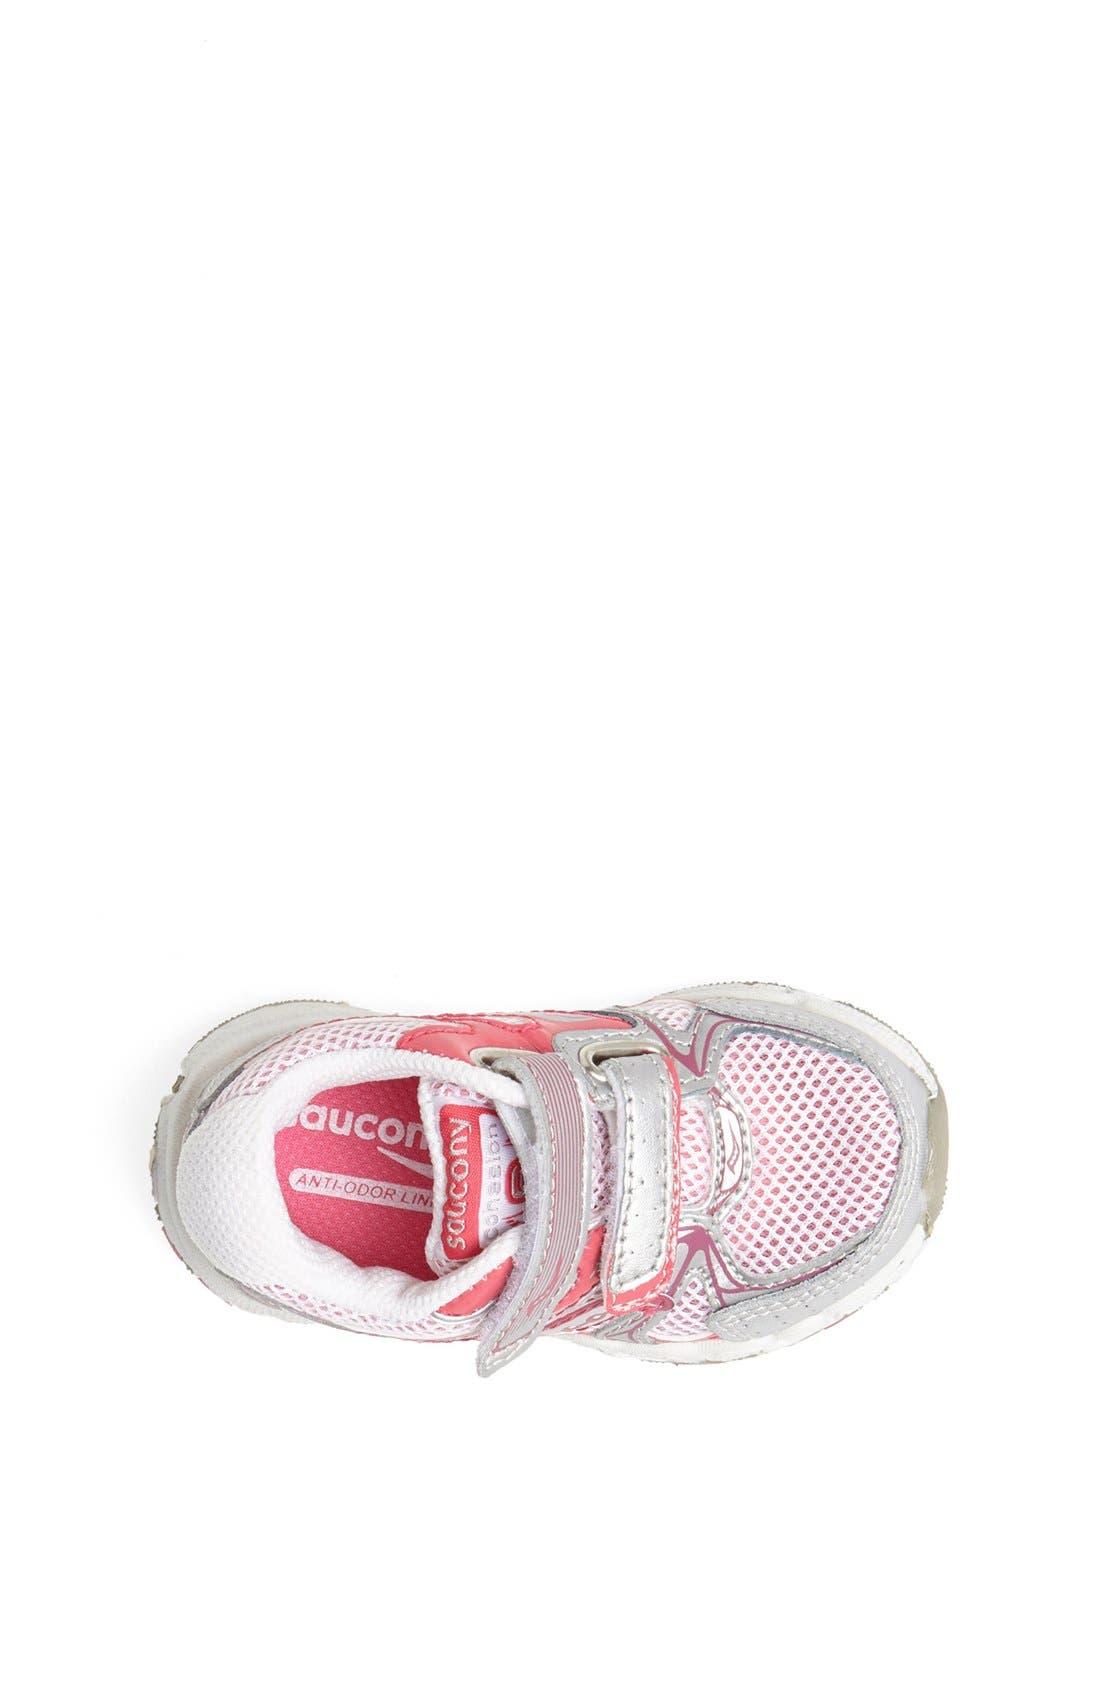 Alternate Image 3  - Saucony 'Cohesion' Sneaker (Walker & Toddler)